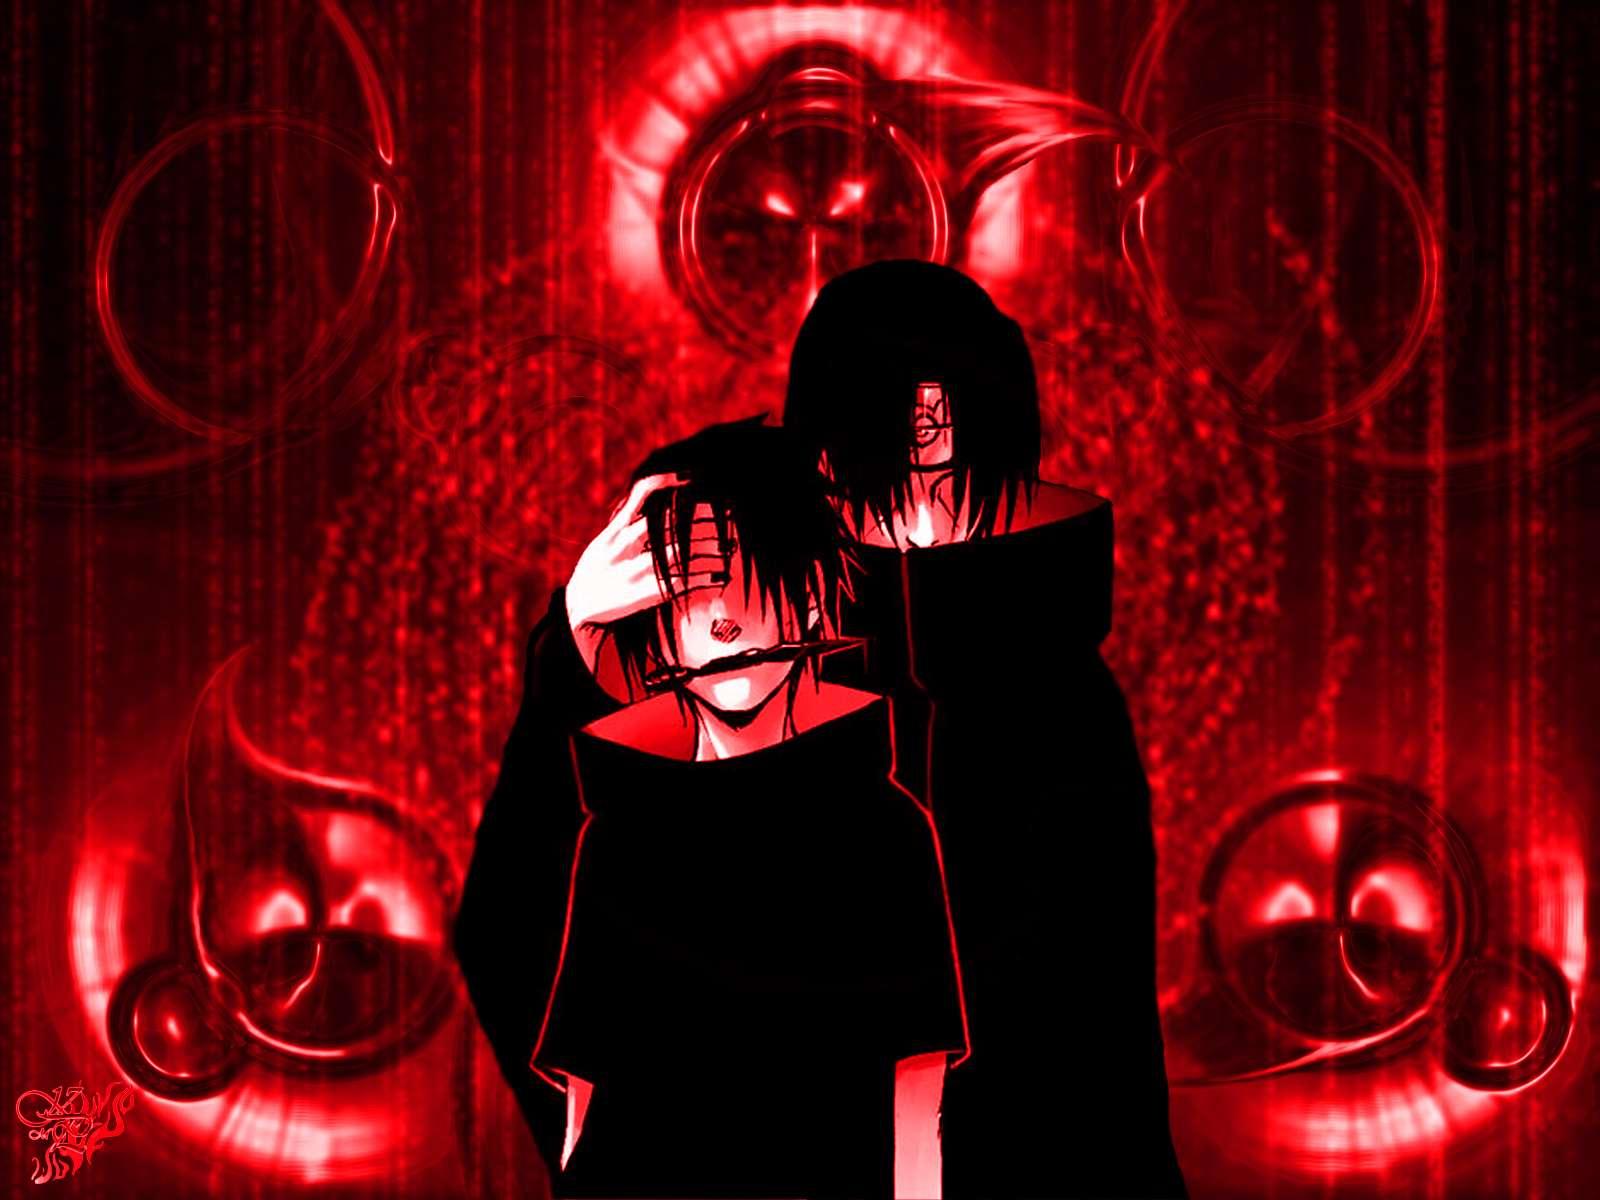 50 Naruto HD Wallpaper Anime Wallpaper Pack Download 1600x1200